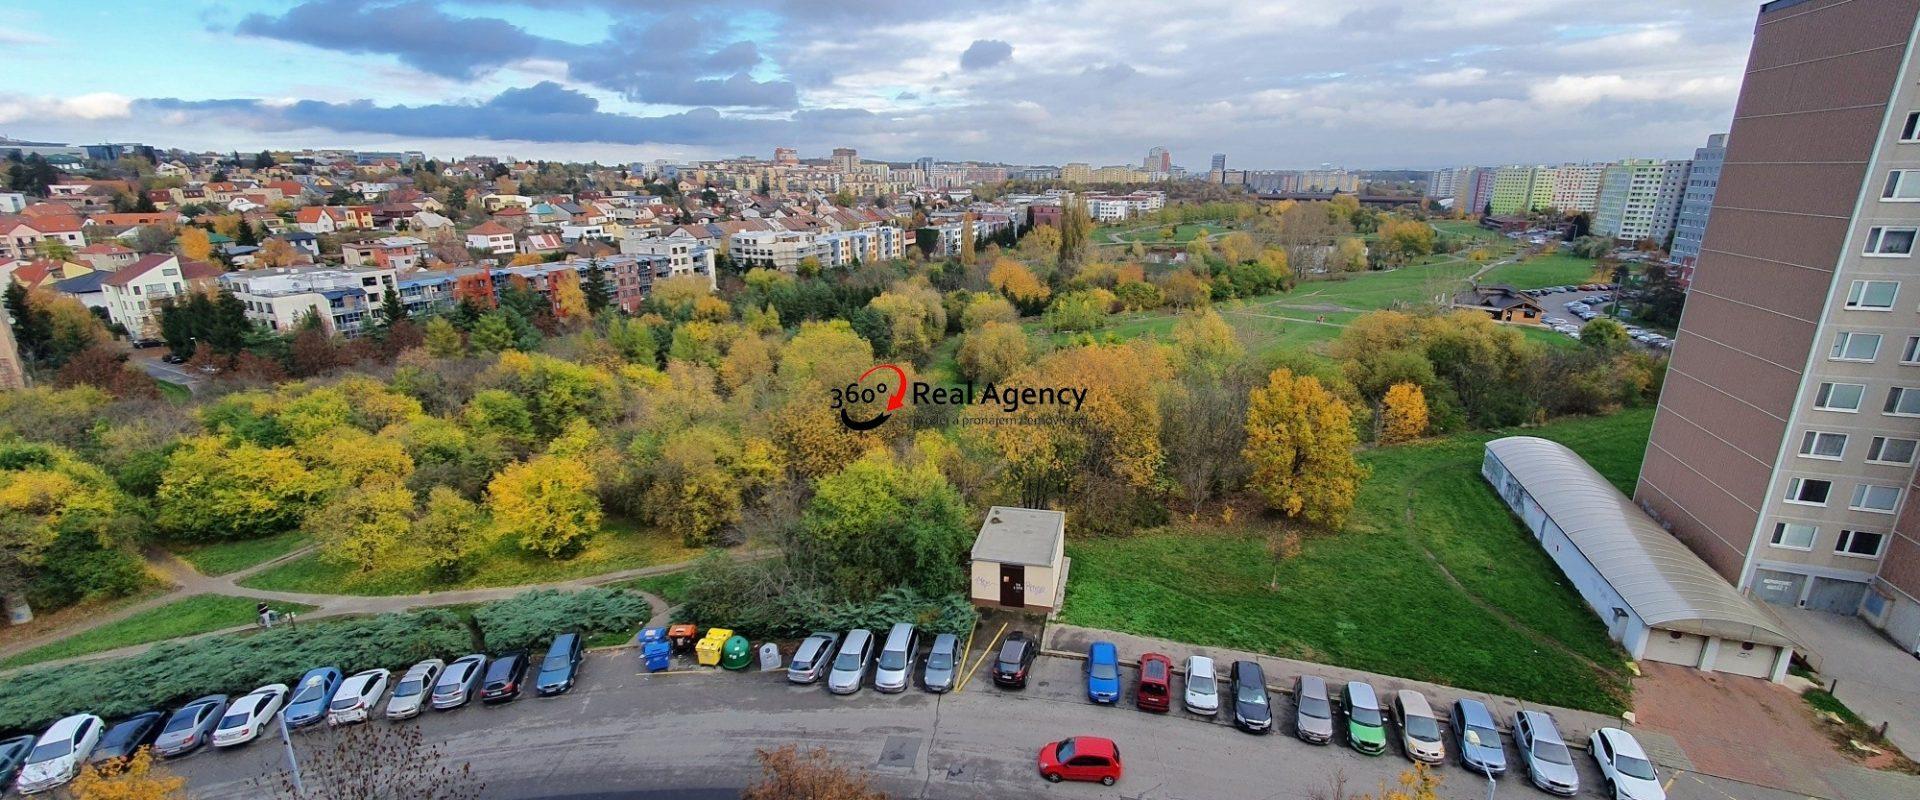 Prodej bytu 2+kk 45 m² Kettnerova, Praha 5 – Stodůlky.